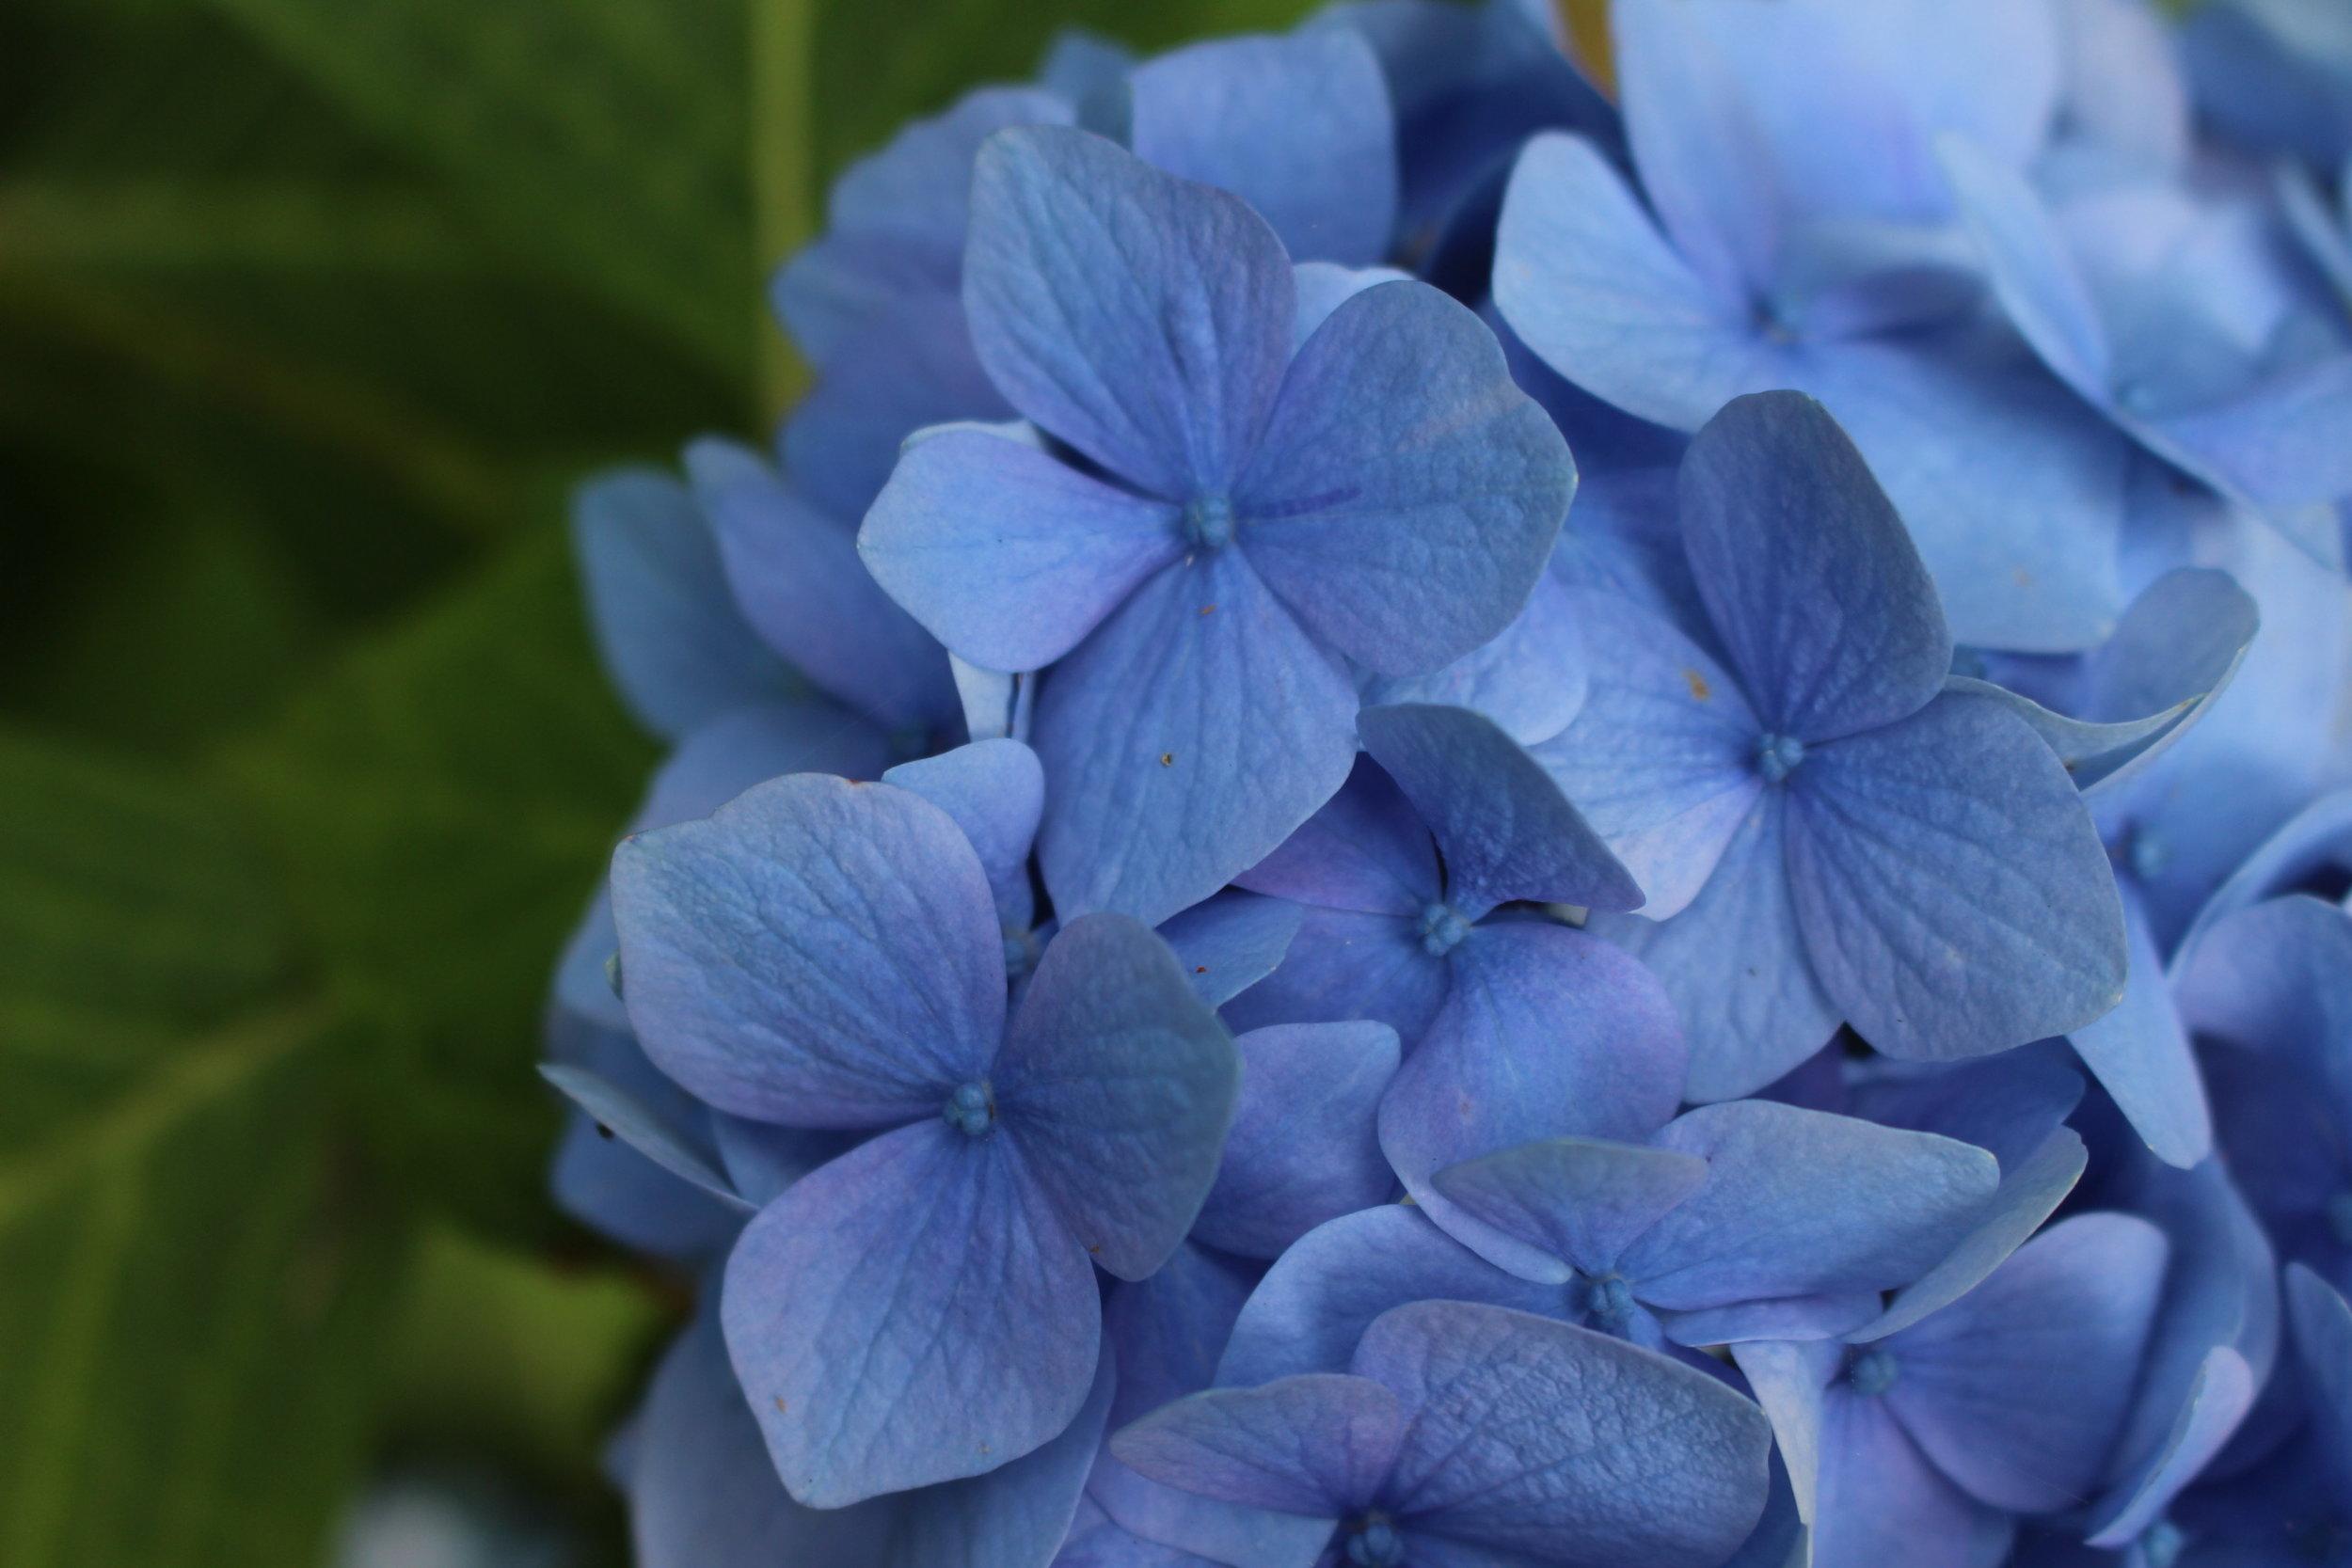 #72 Hydrangea, Hydrangea macrophylla